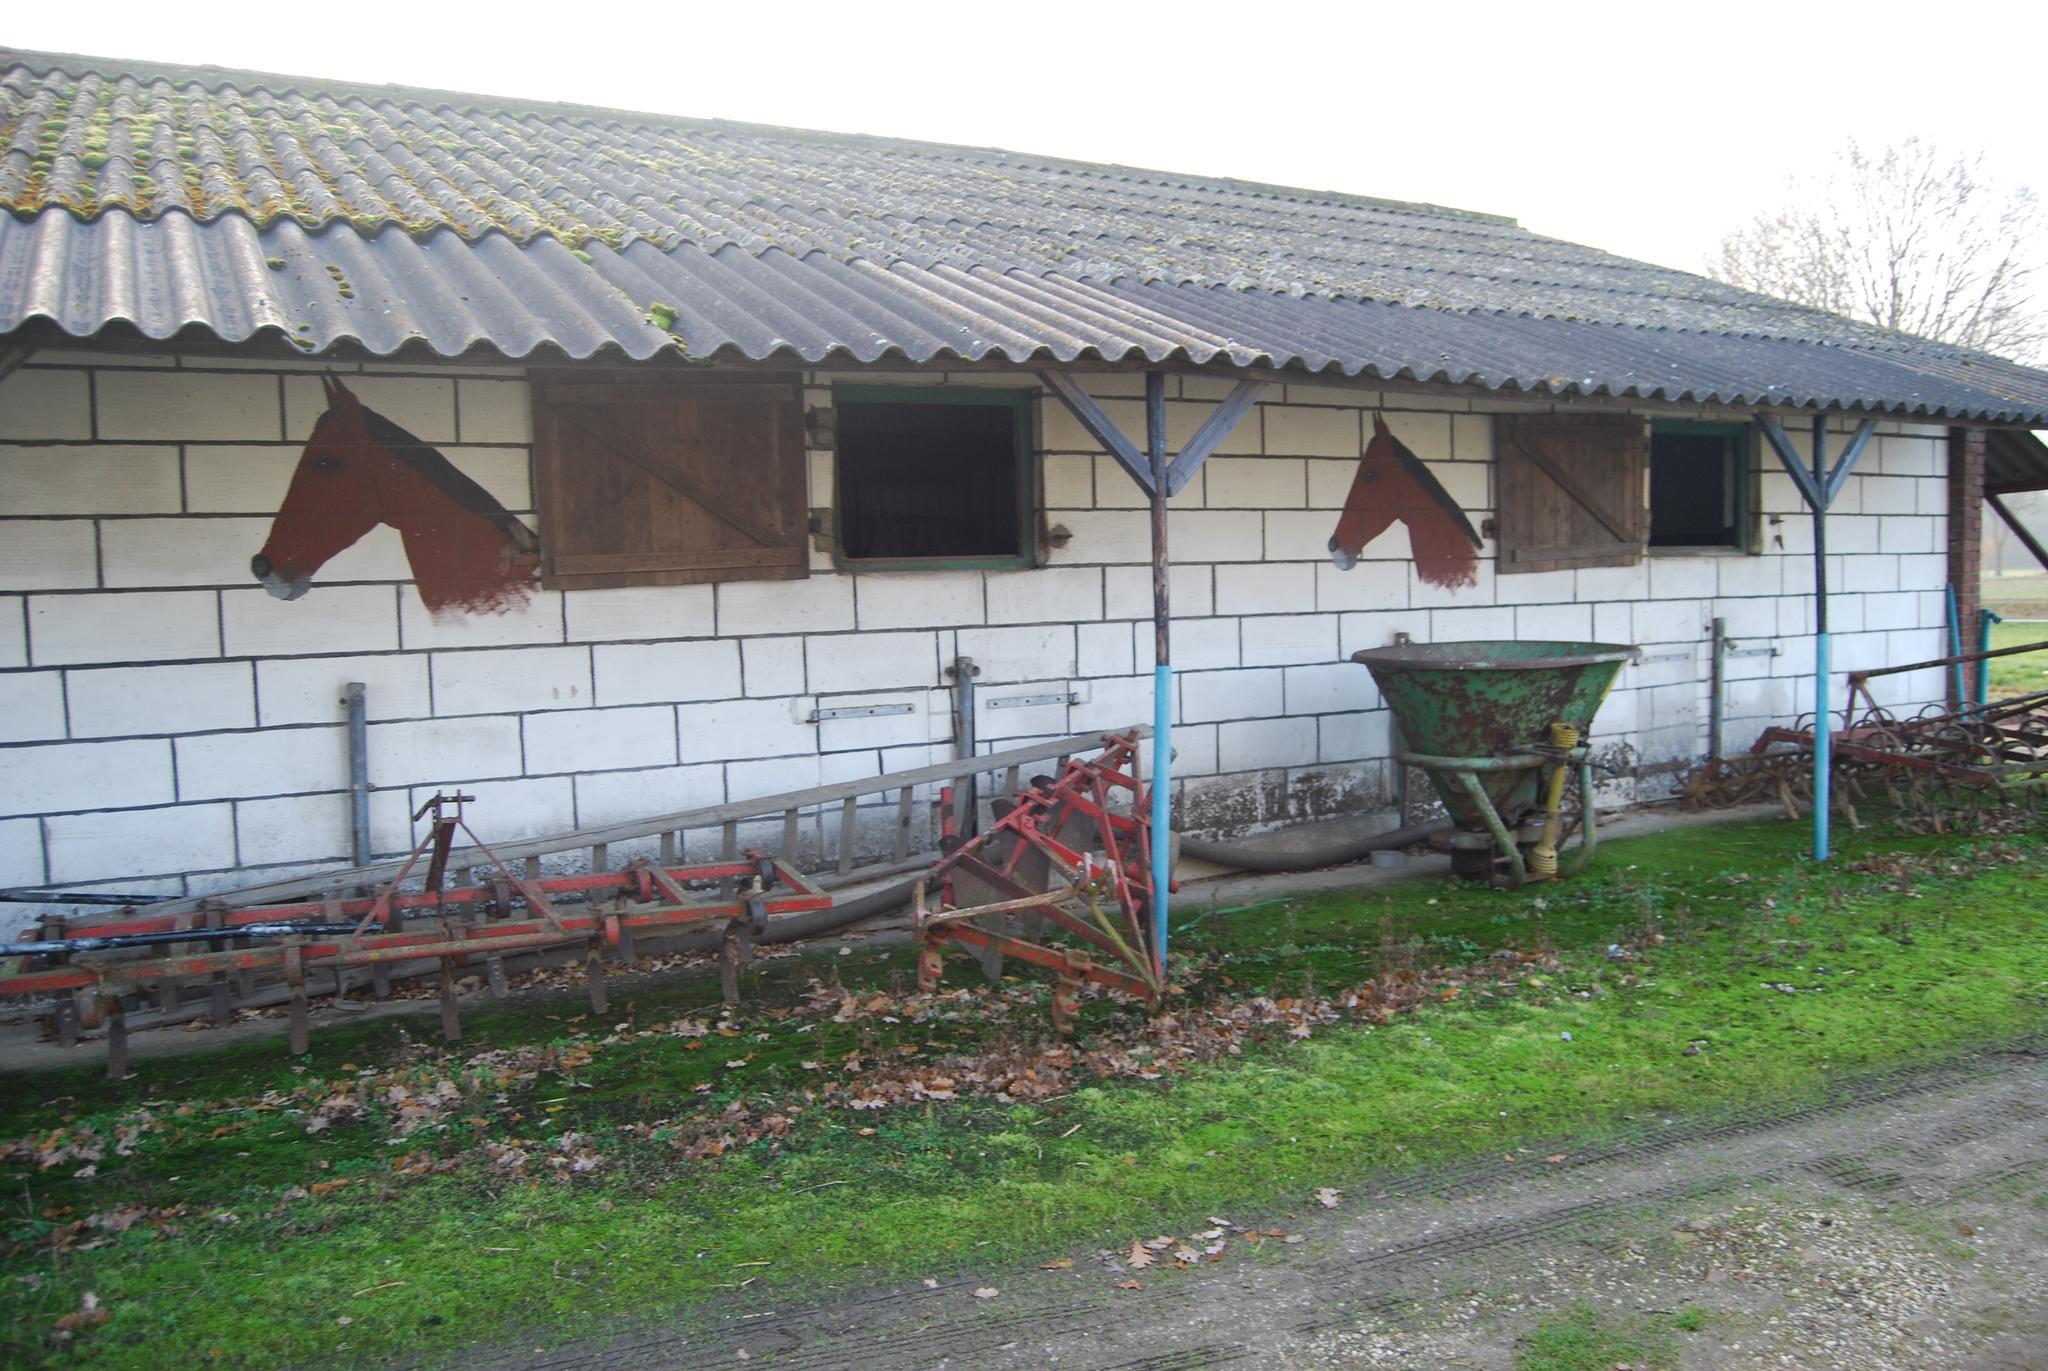 Mommersweg 1 in belfeld 5951 nh paardenhouderij te koop for Paardenbedrijf te koop